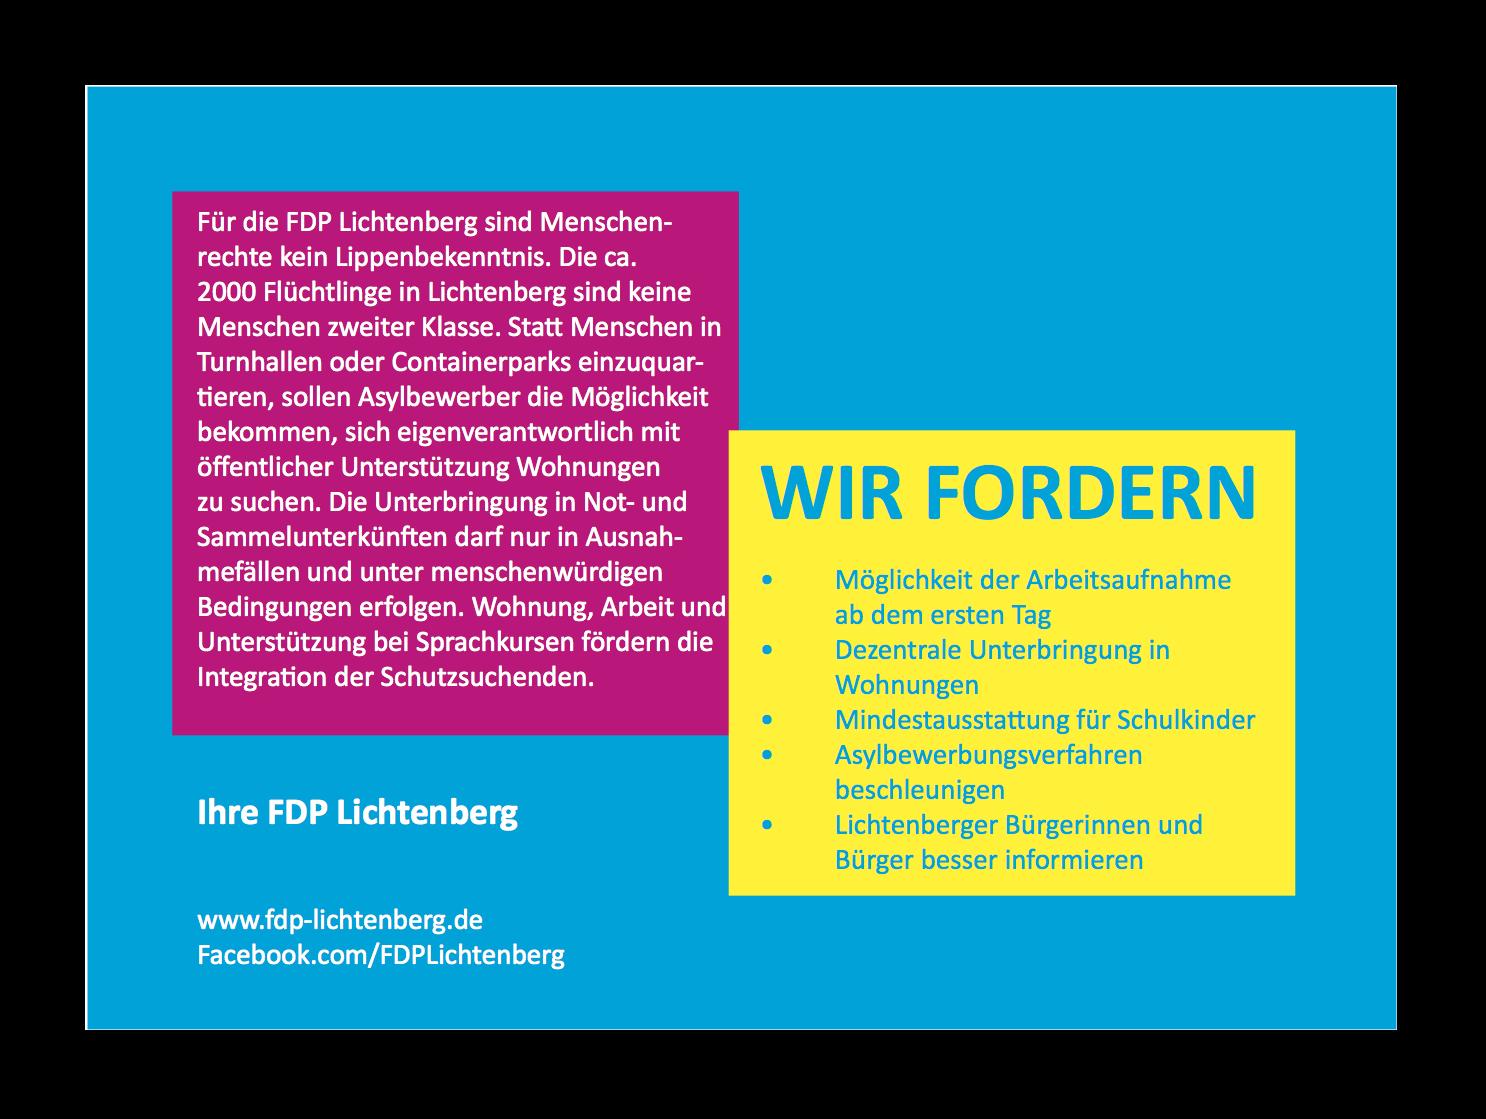 FDP Postkarte Flüchtlinge Rückseite